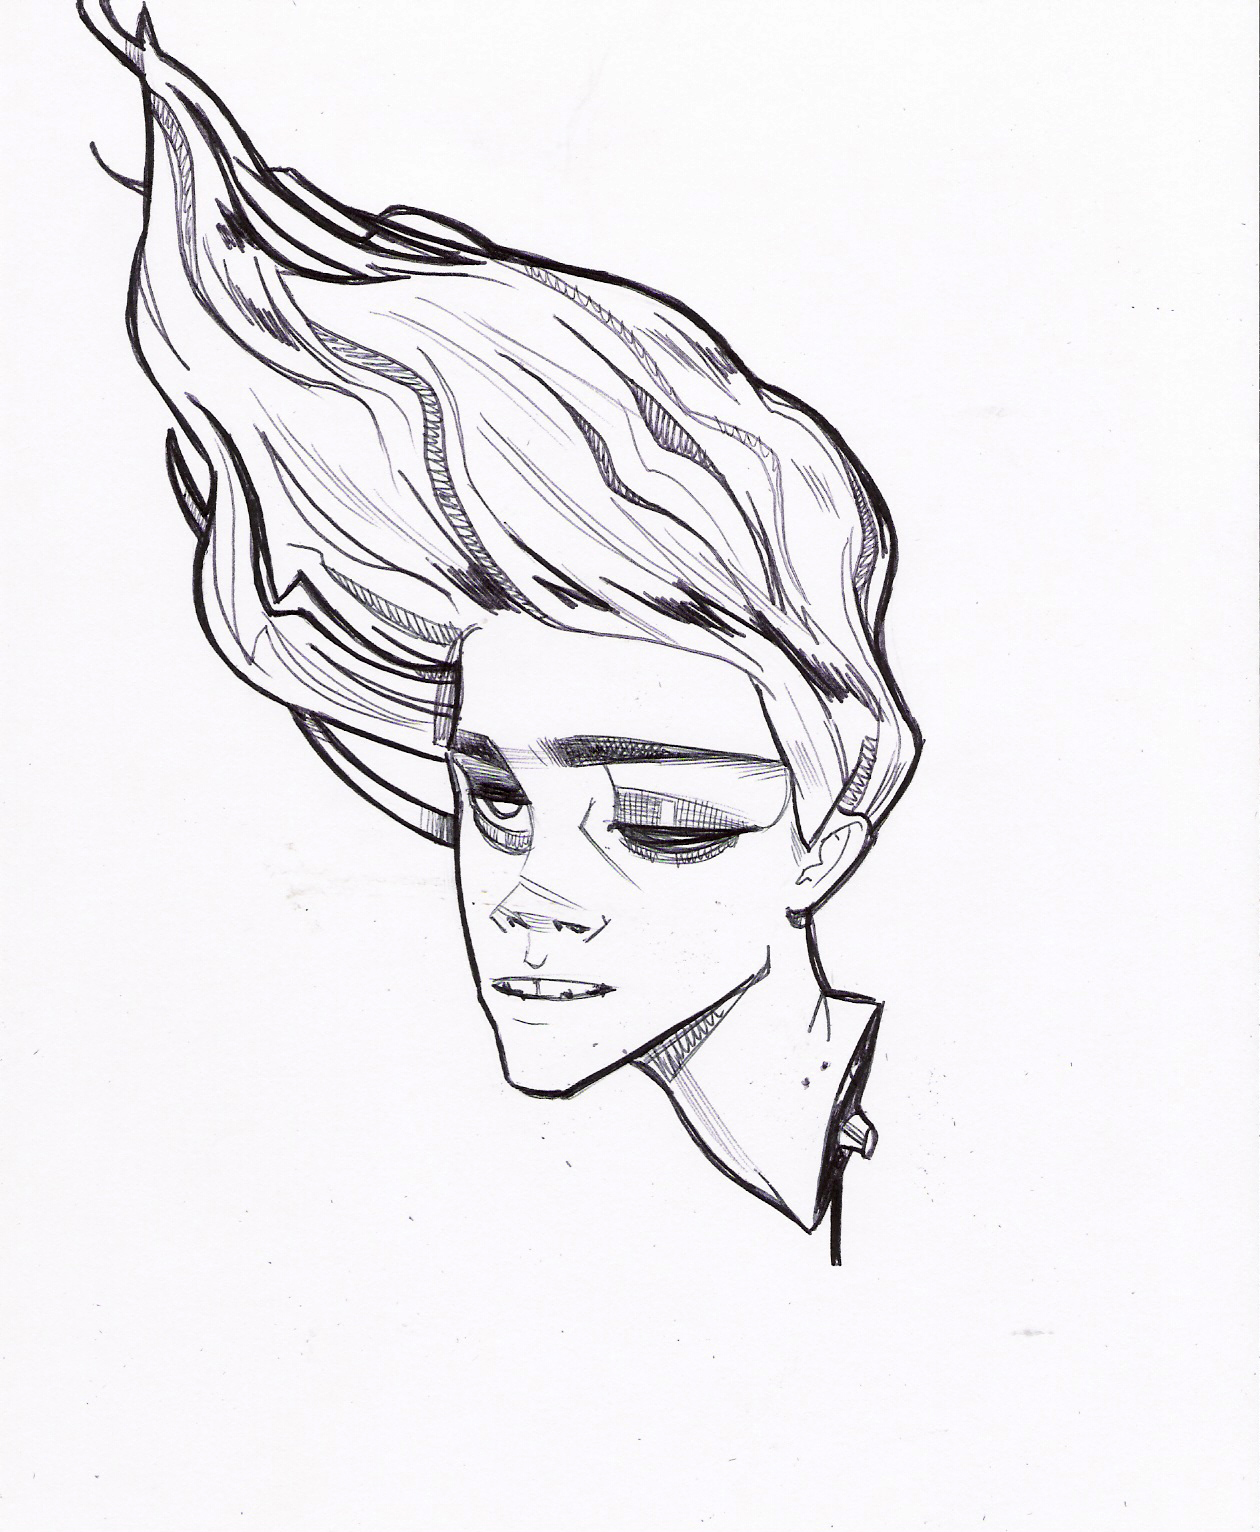 maria lamborghini coloring pages - photo #15